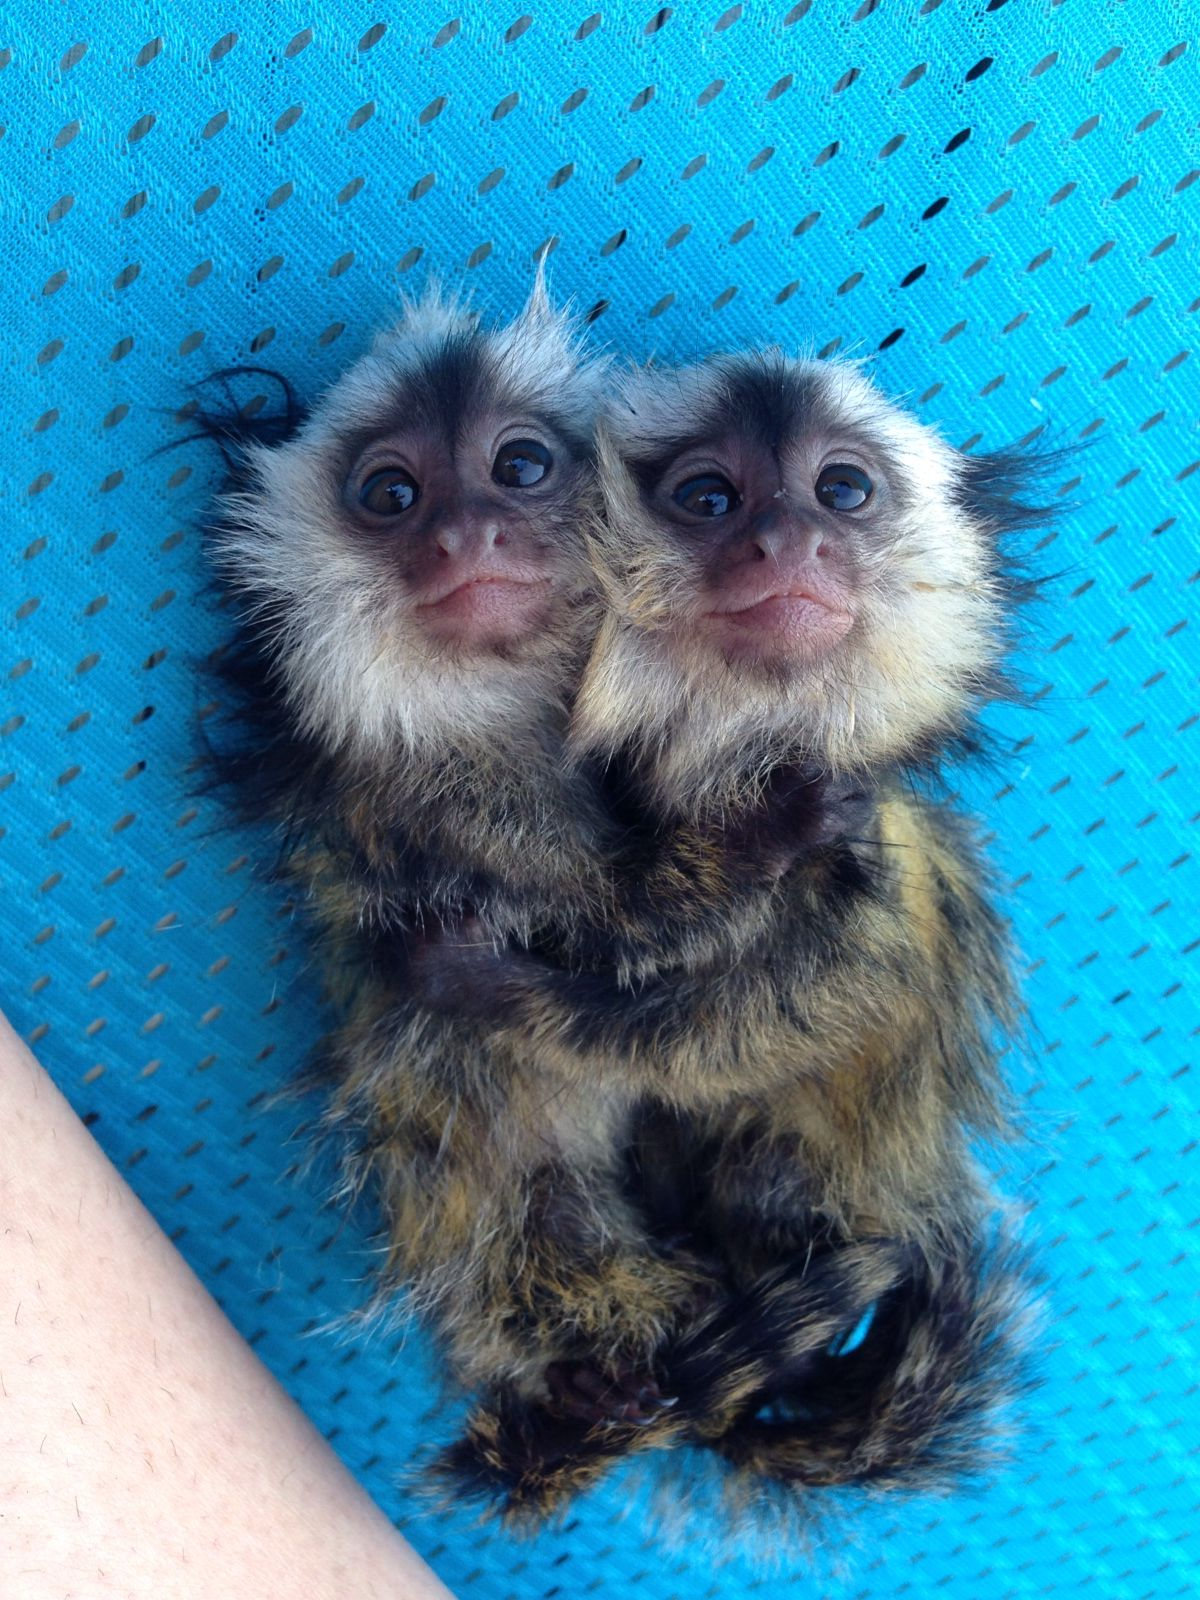 Pin By Kelli Sunshyne Hoover On Funny Cute Baby Animals Animals Beautiful Baby Animals Funny